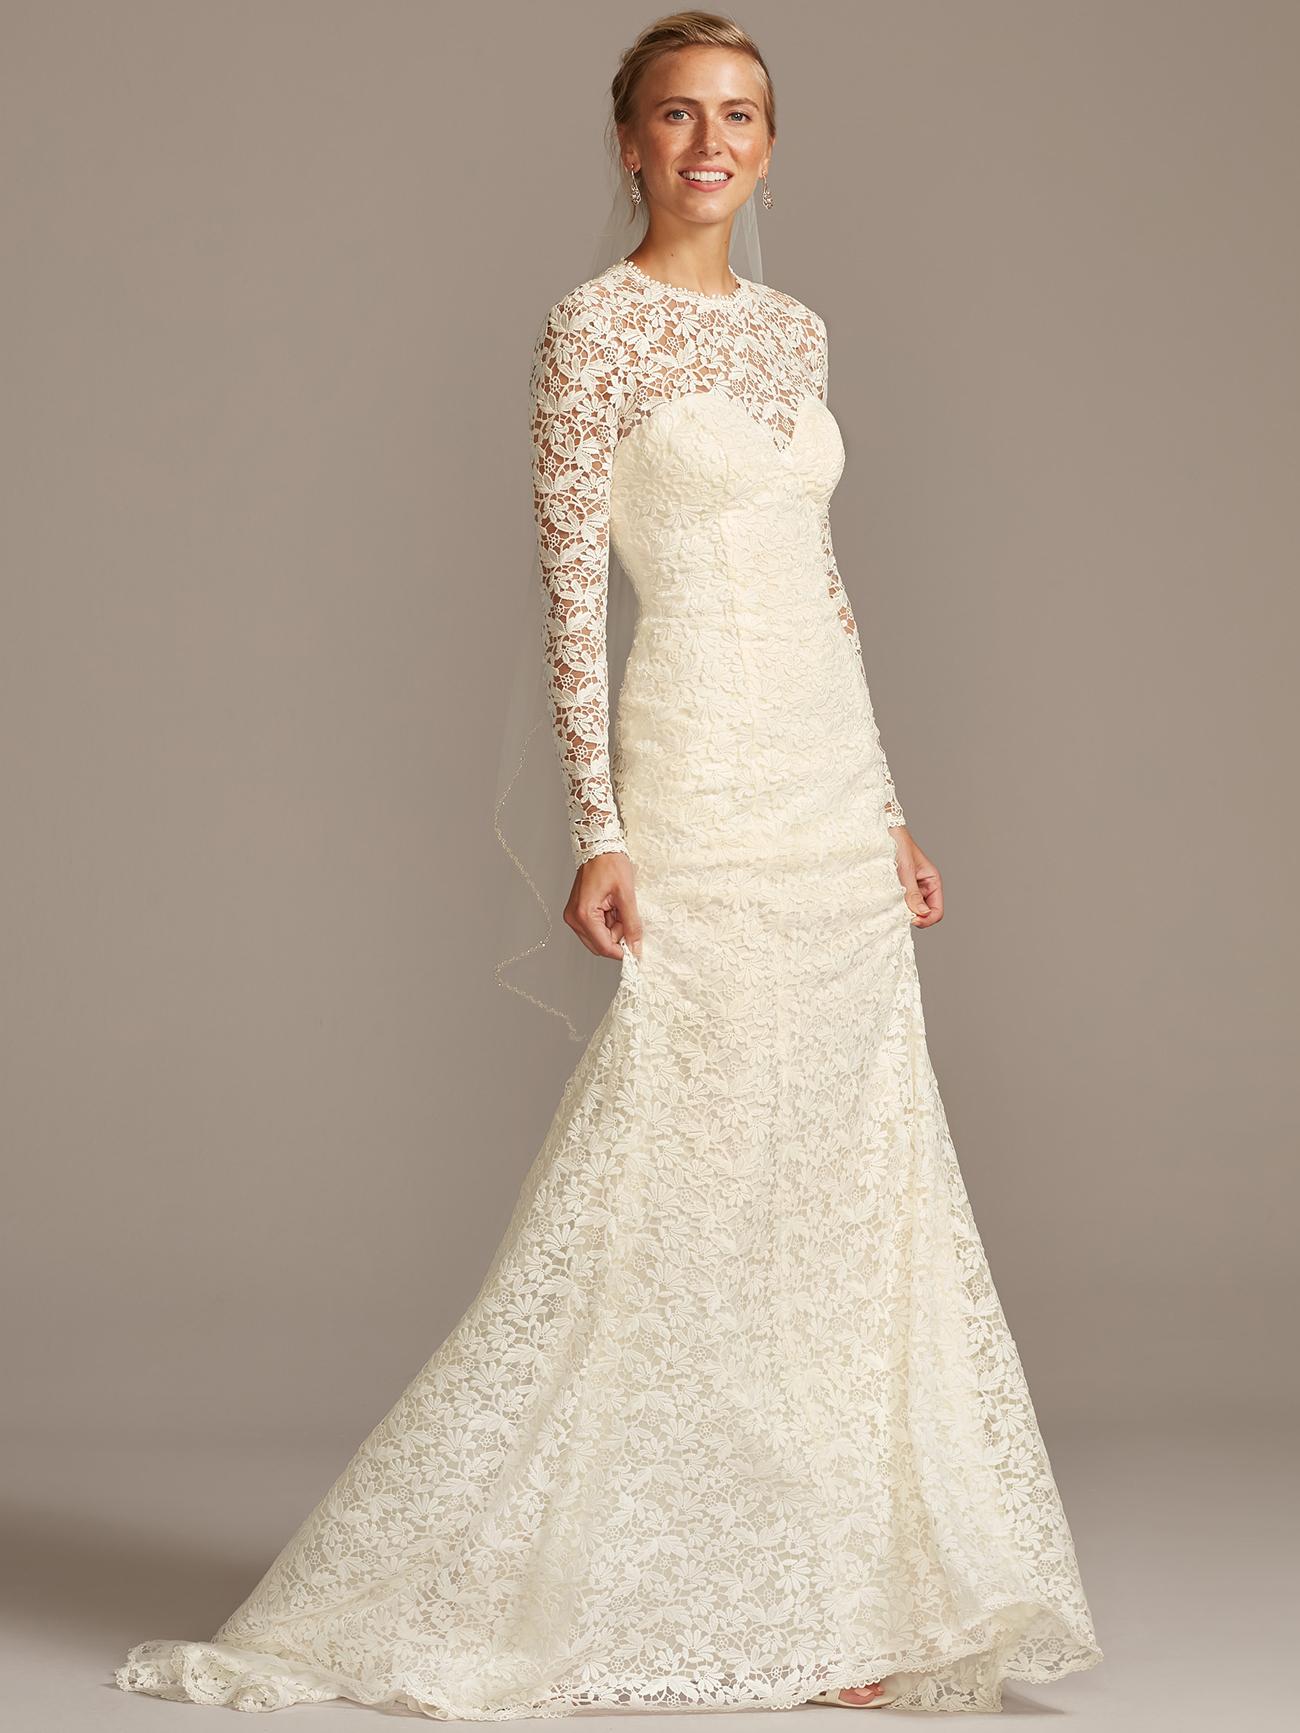 davids bridal melissa sweet lace long sleeve illusion v-neck wedding dress fall 2020